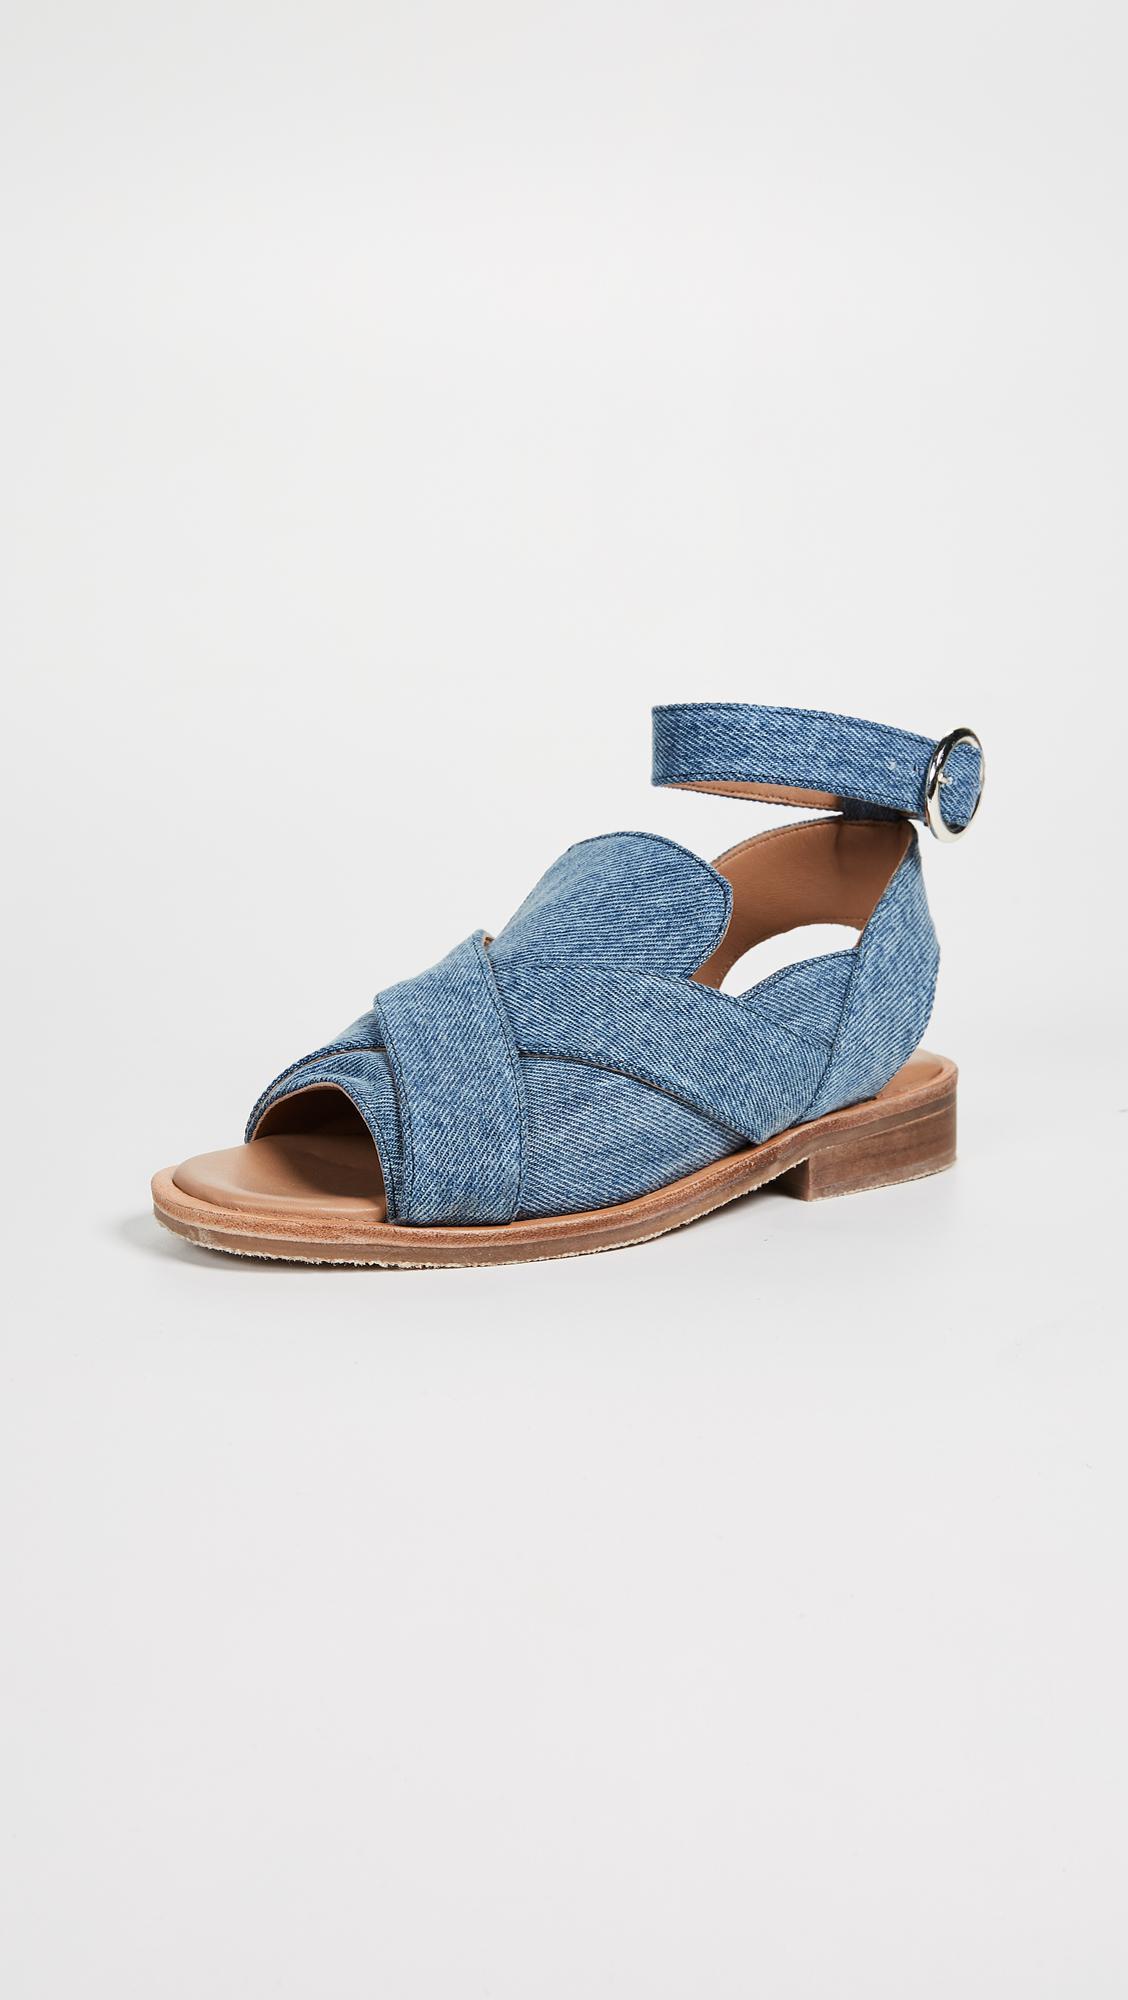 Free People Catherine Leather Loafer Sandal 1NJXOyuqk